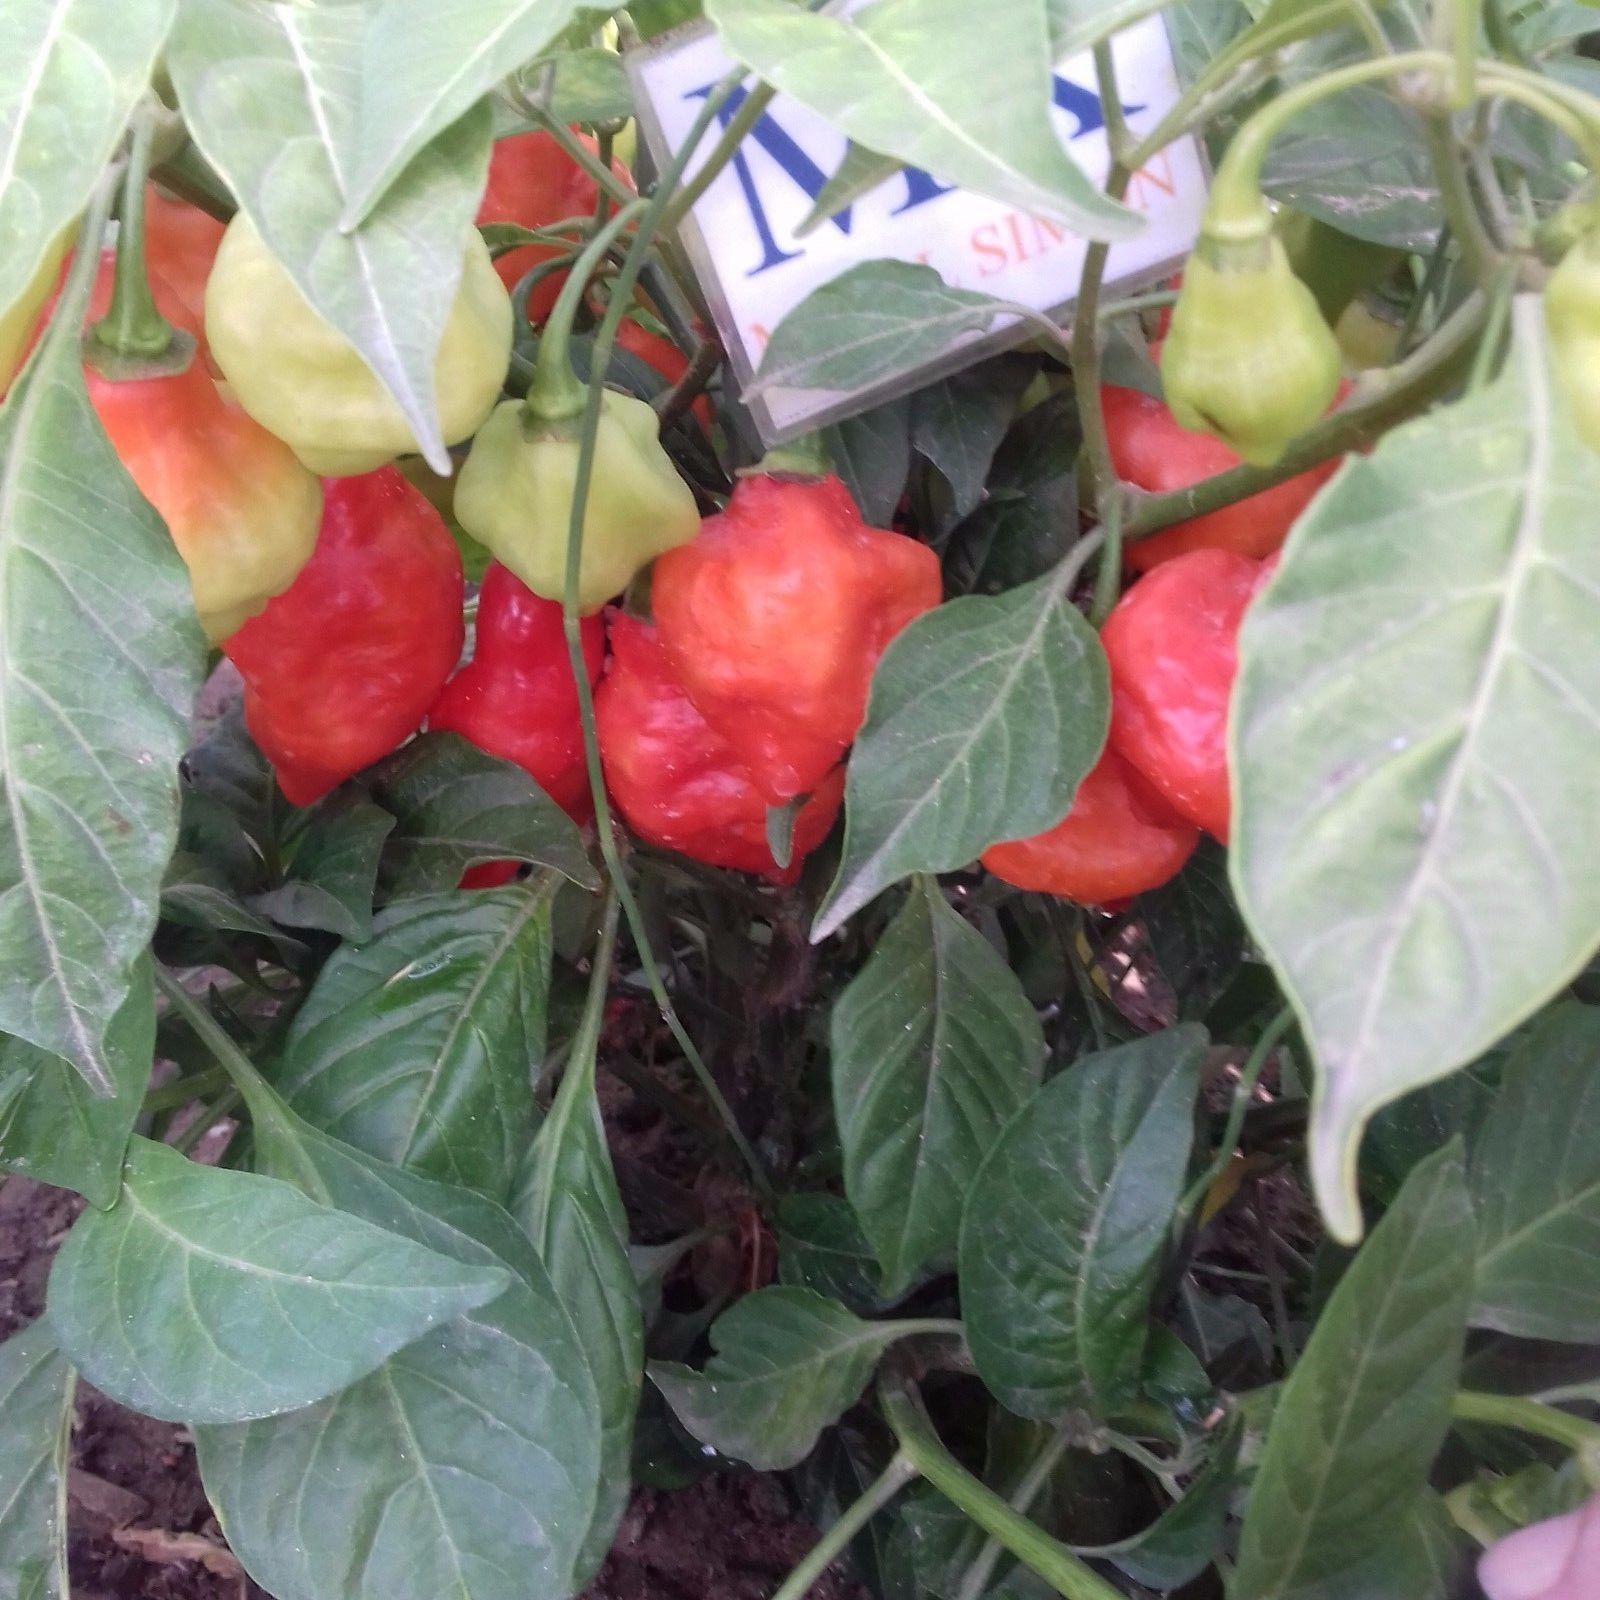 BILLY GOAT ,20 SEMILLAS,SEEDS,Capsicum chinense ,cosecha propia(80)